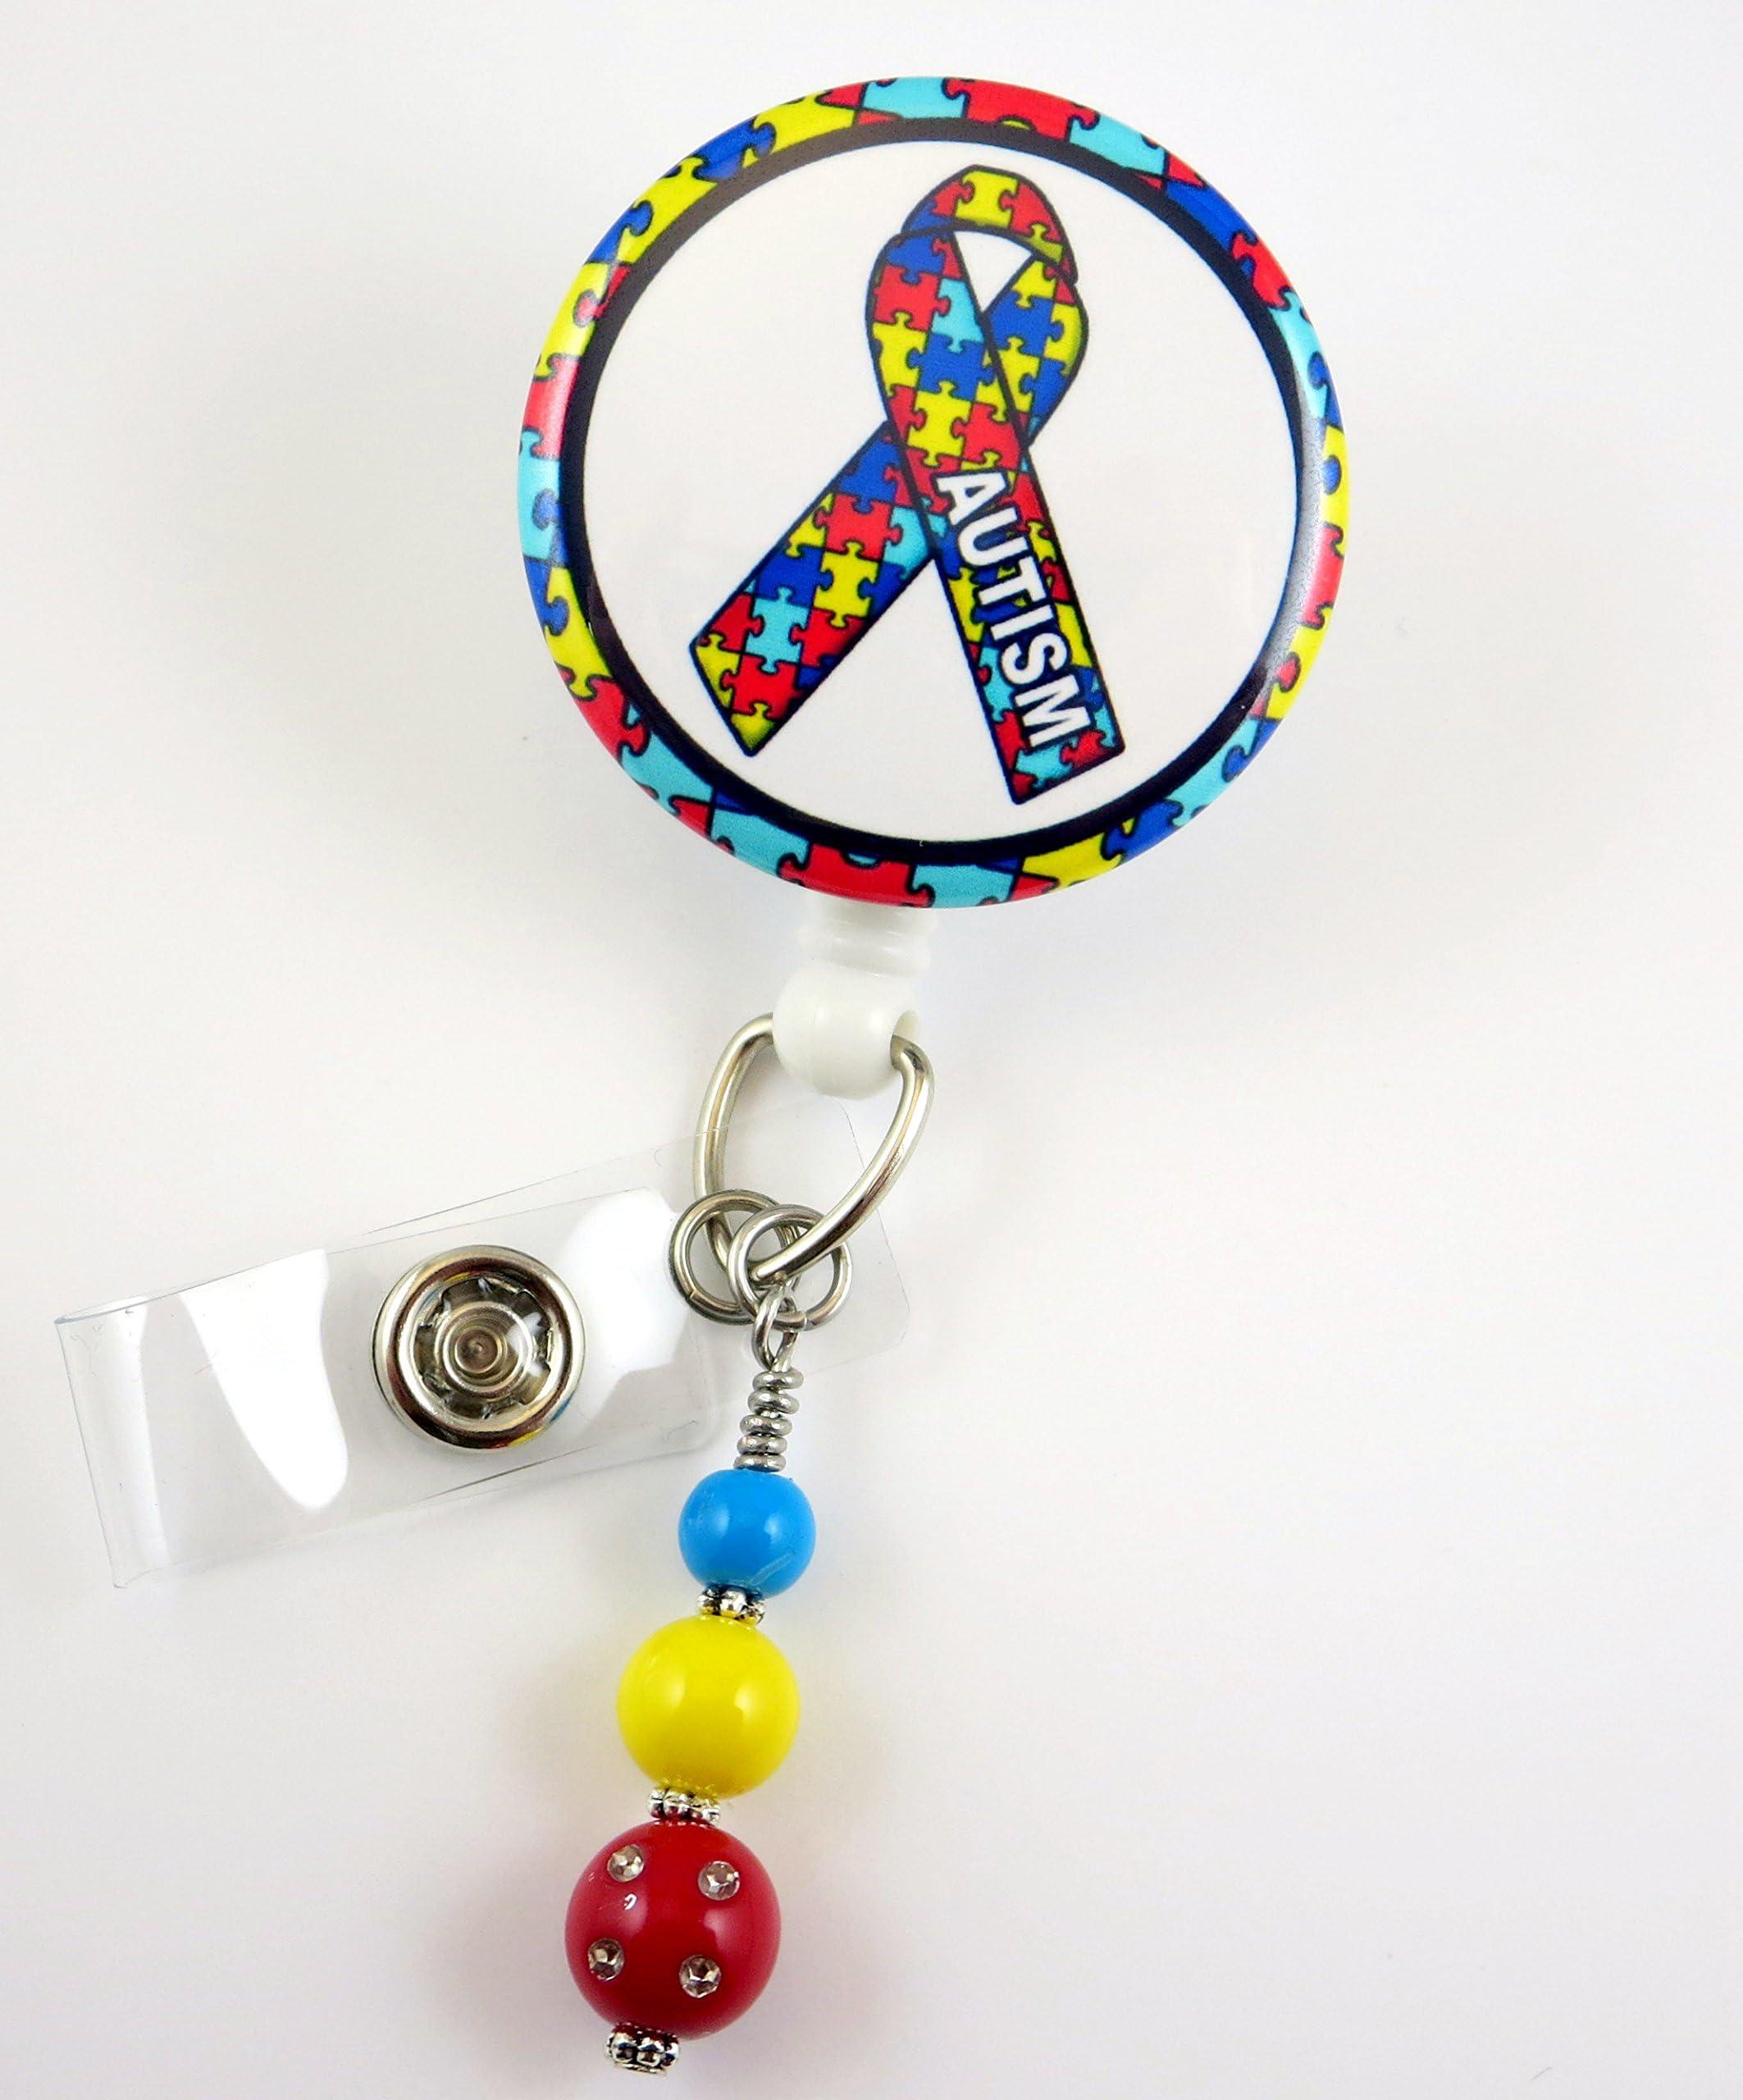 Rehab Nurse Retractable ID Badge Holder-Name Badge Holder-Nurses Badge-Badge Clip-Badge Reels-Pediatric-RN-Nursing Badge Holder